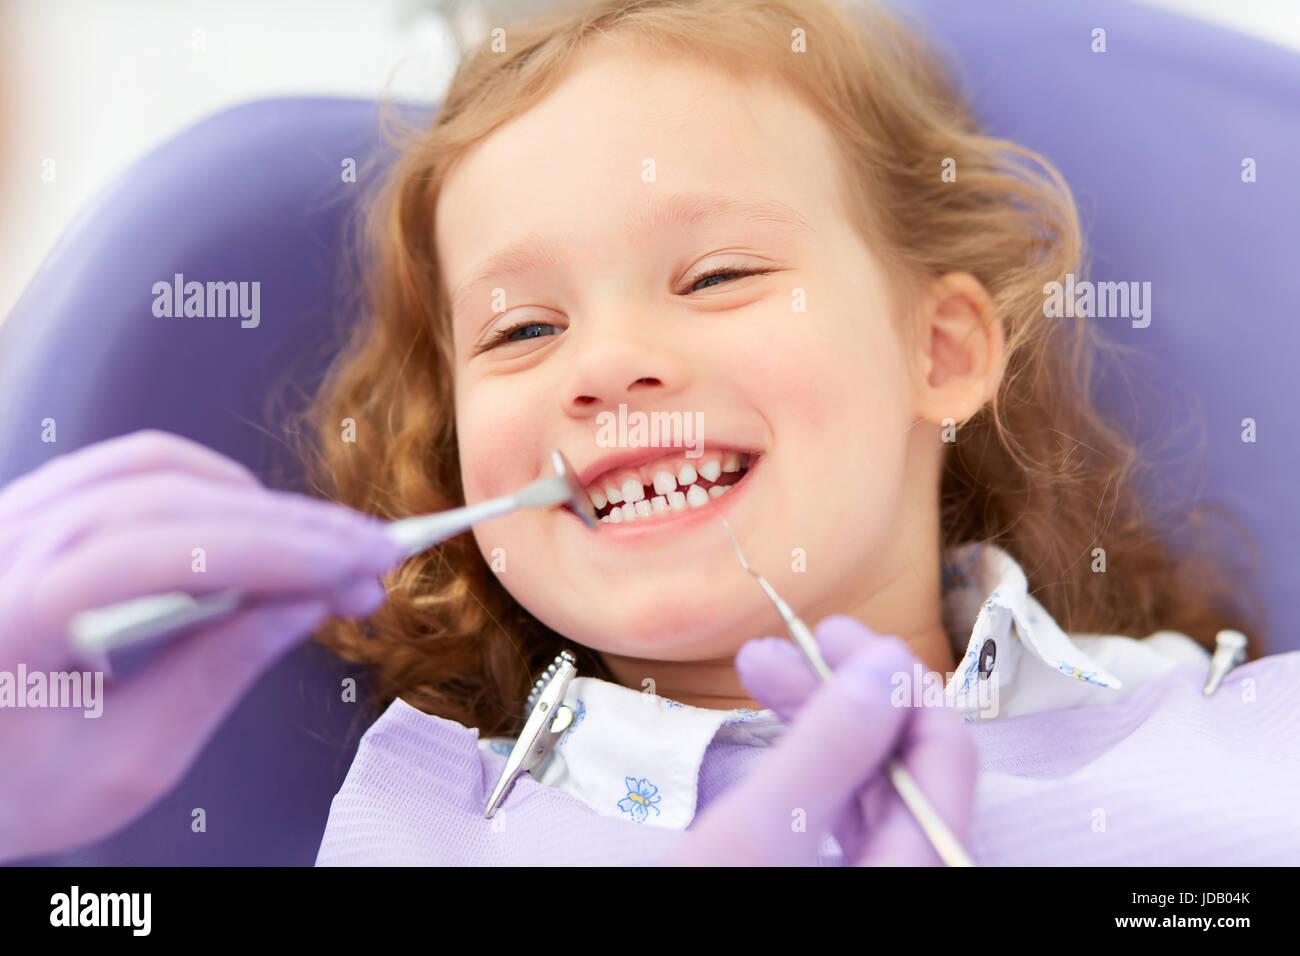 Smiling girl at dentist - Stock Image